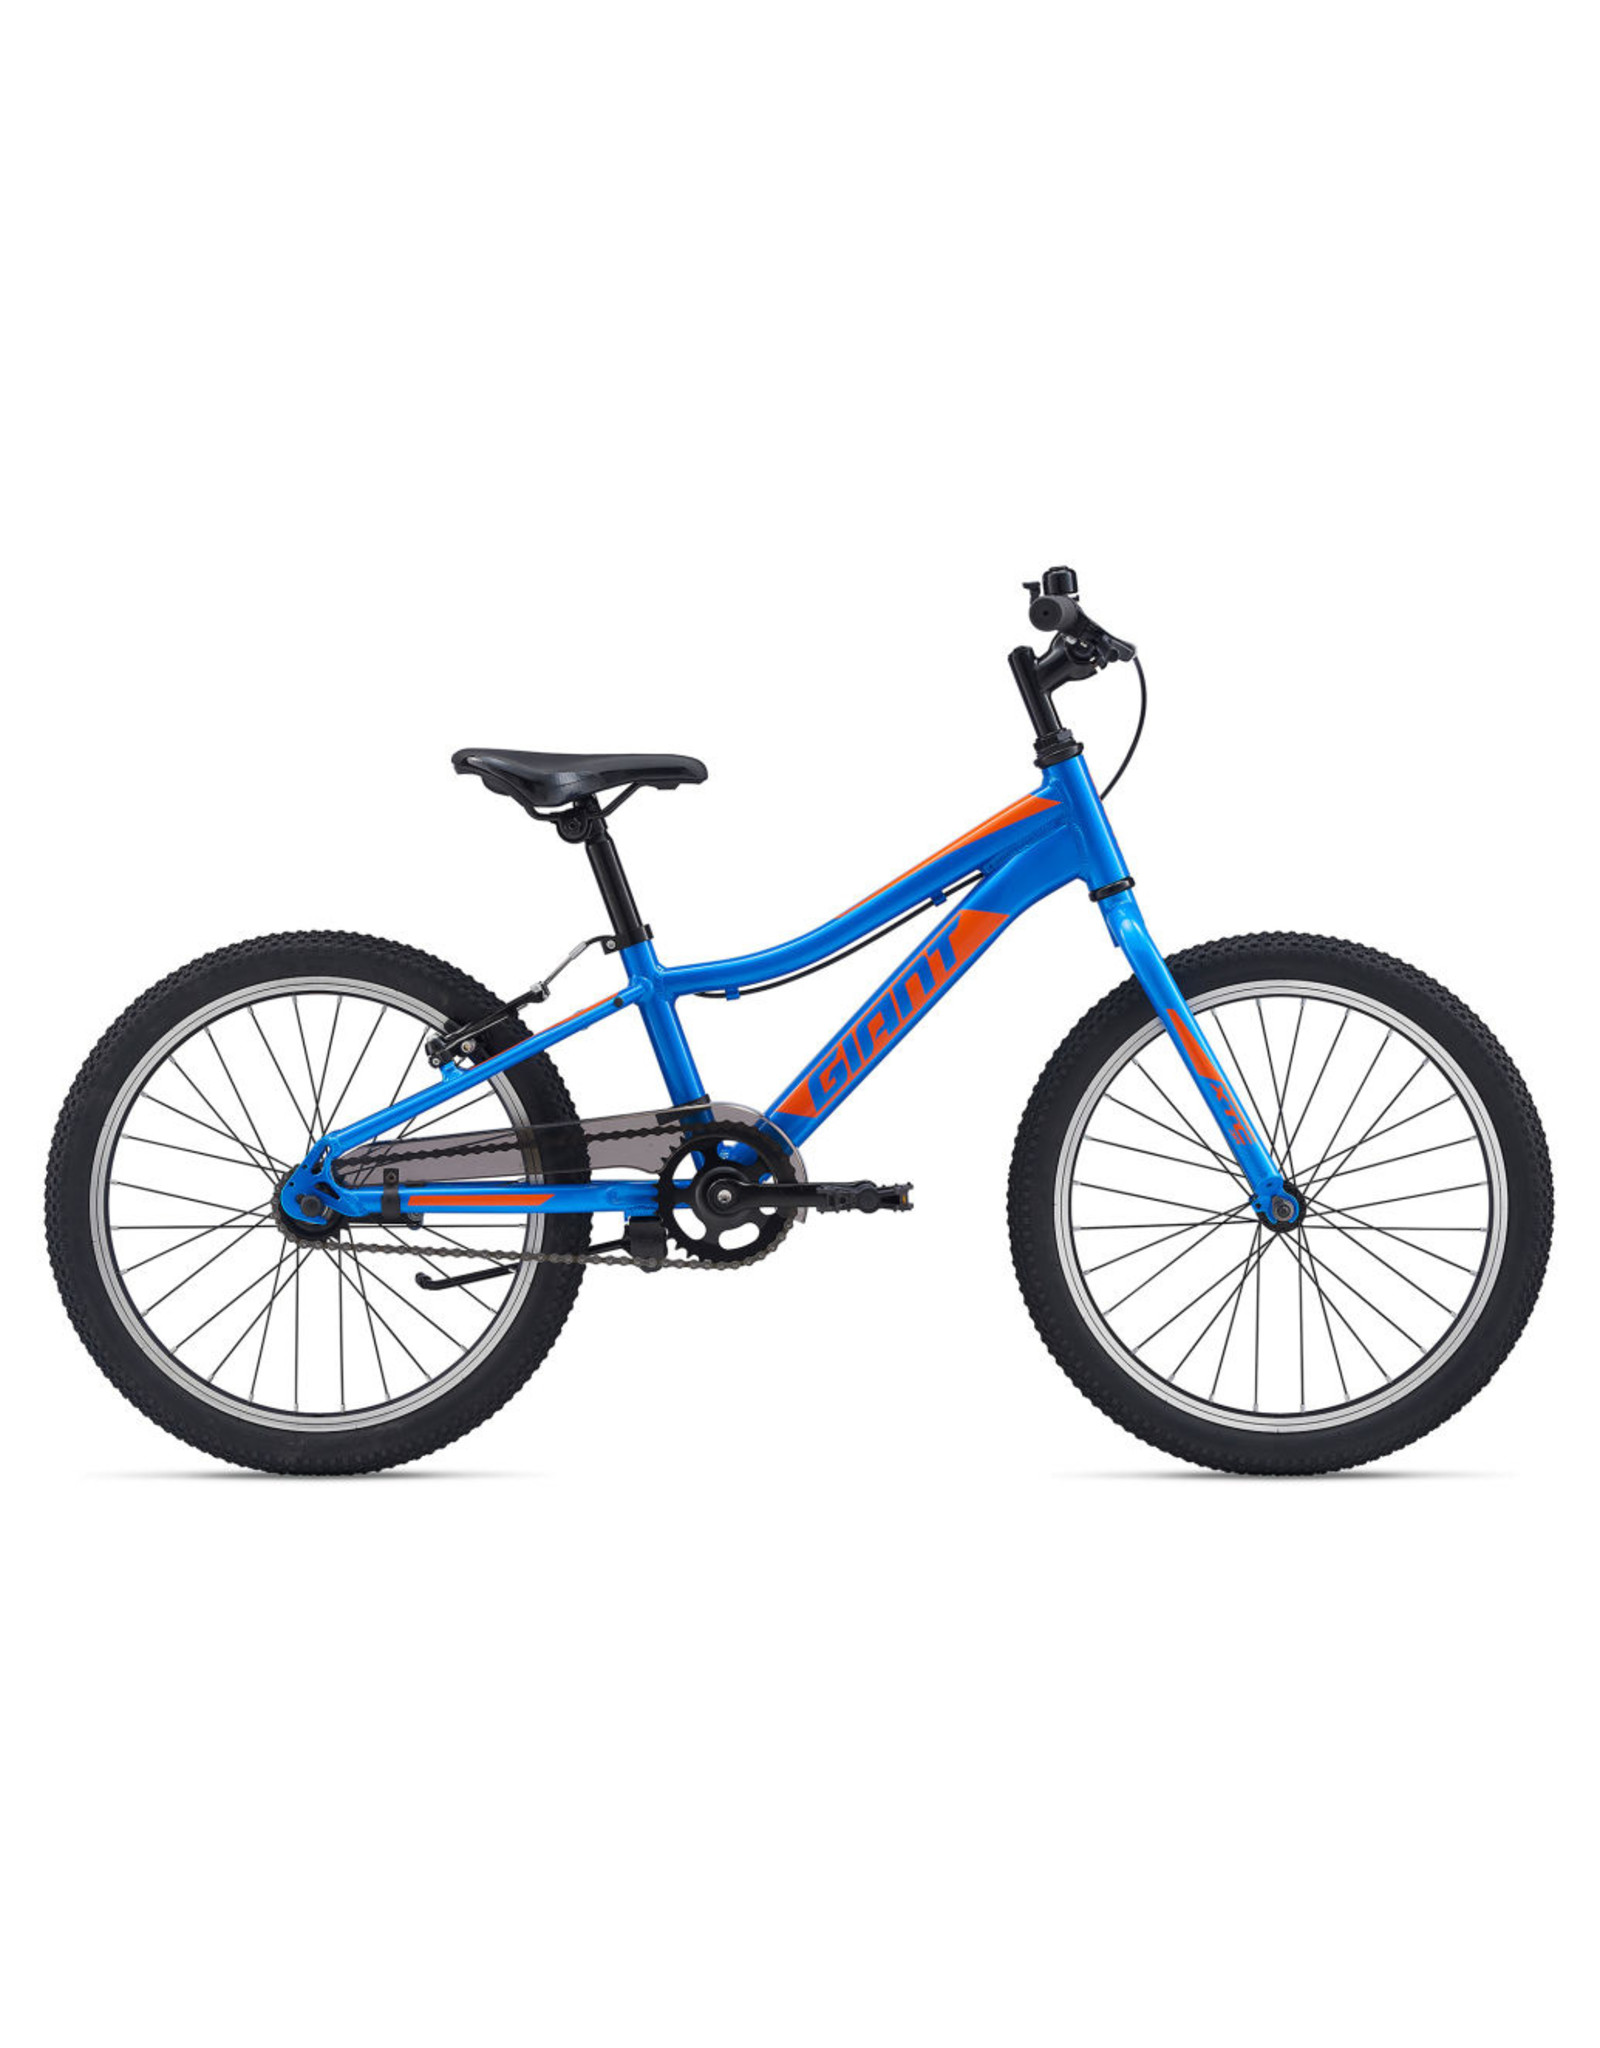 Giant XtC Jr 20 C/B Metallic Blue